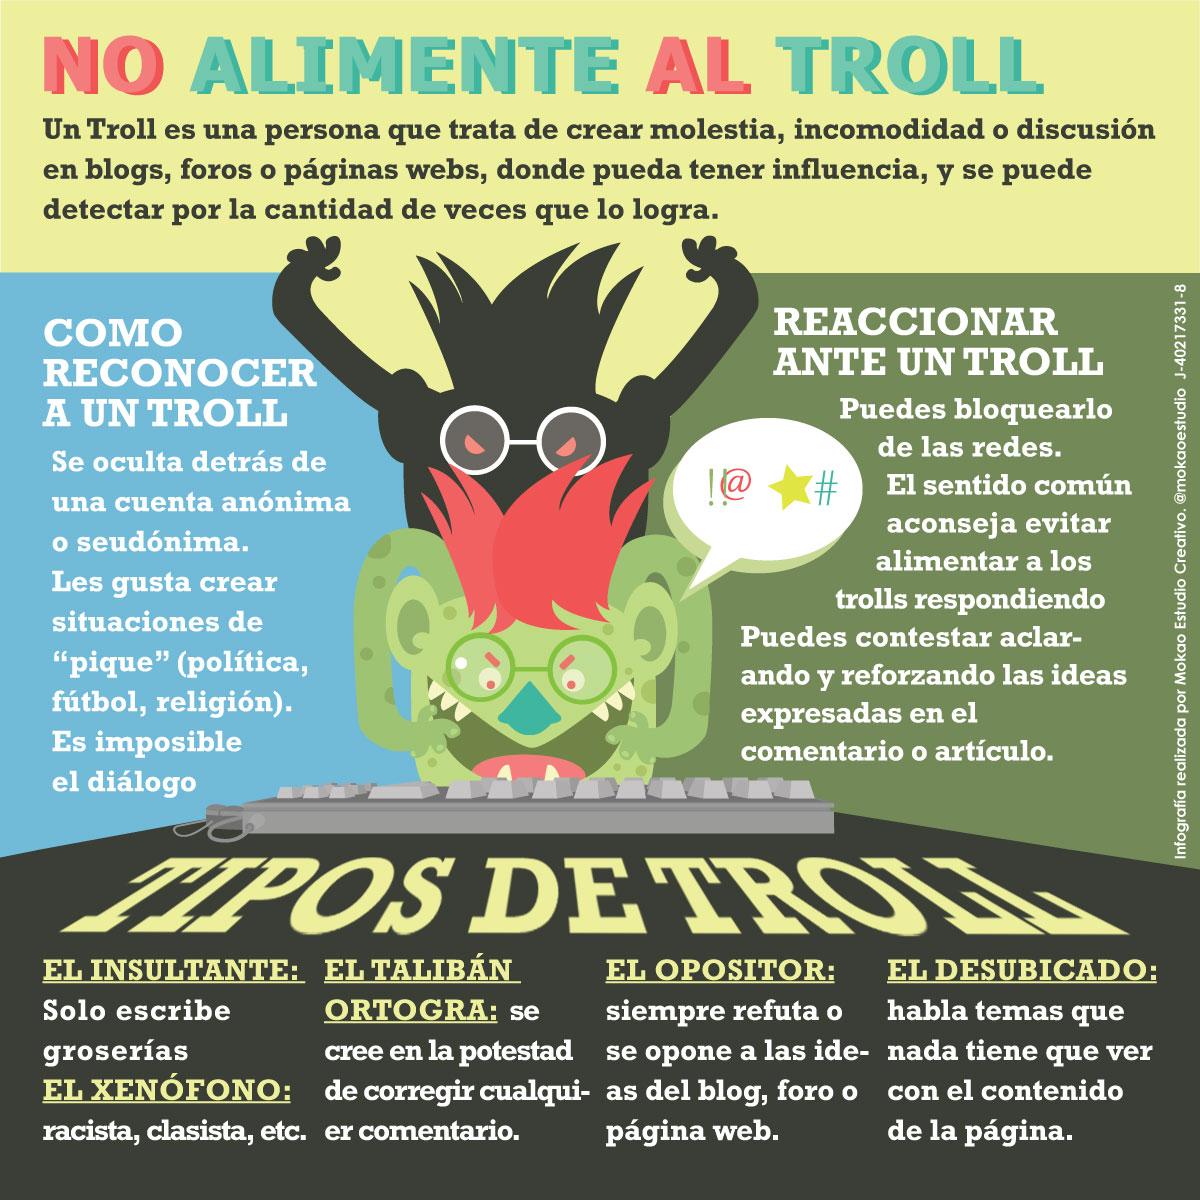 No alimente al troll. FOTO: Tumblr Mokaoestudio